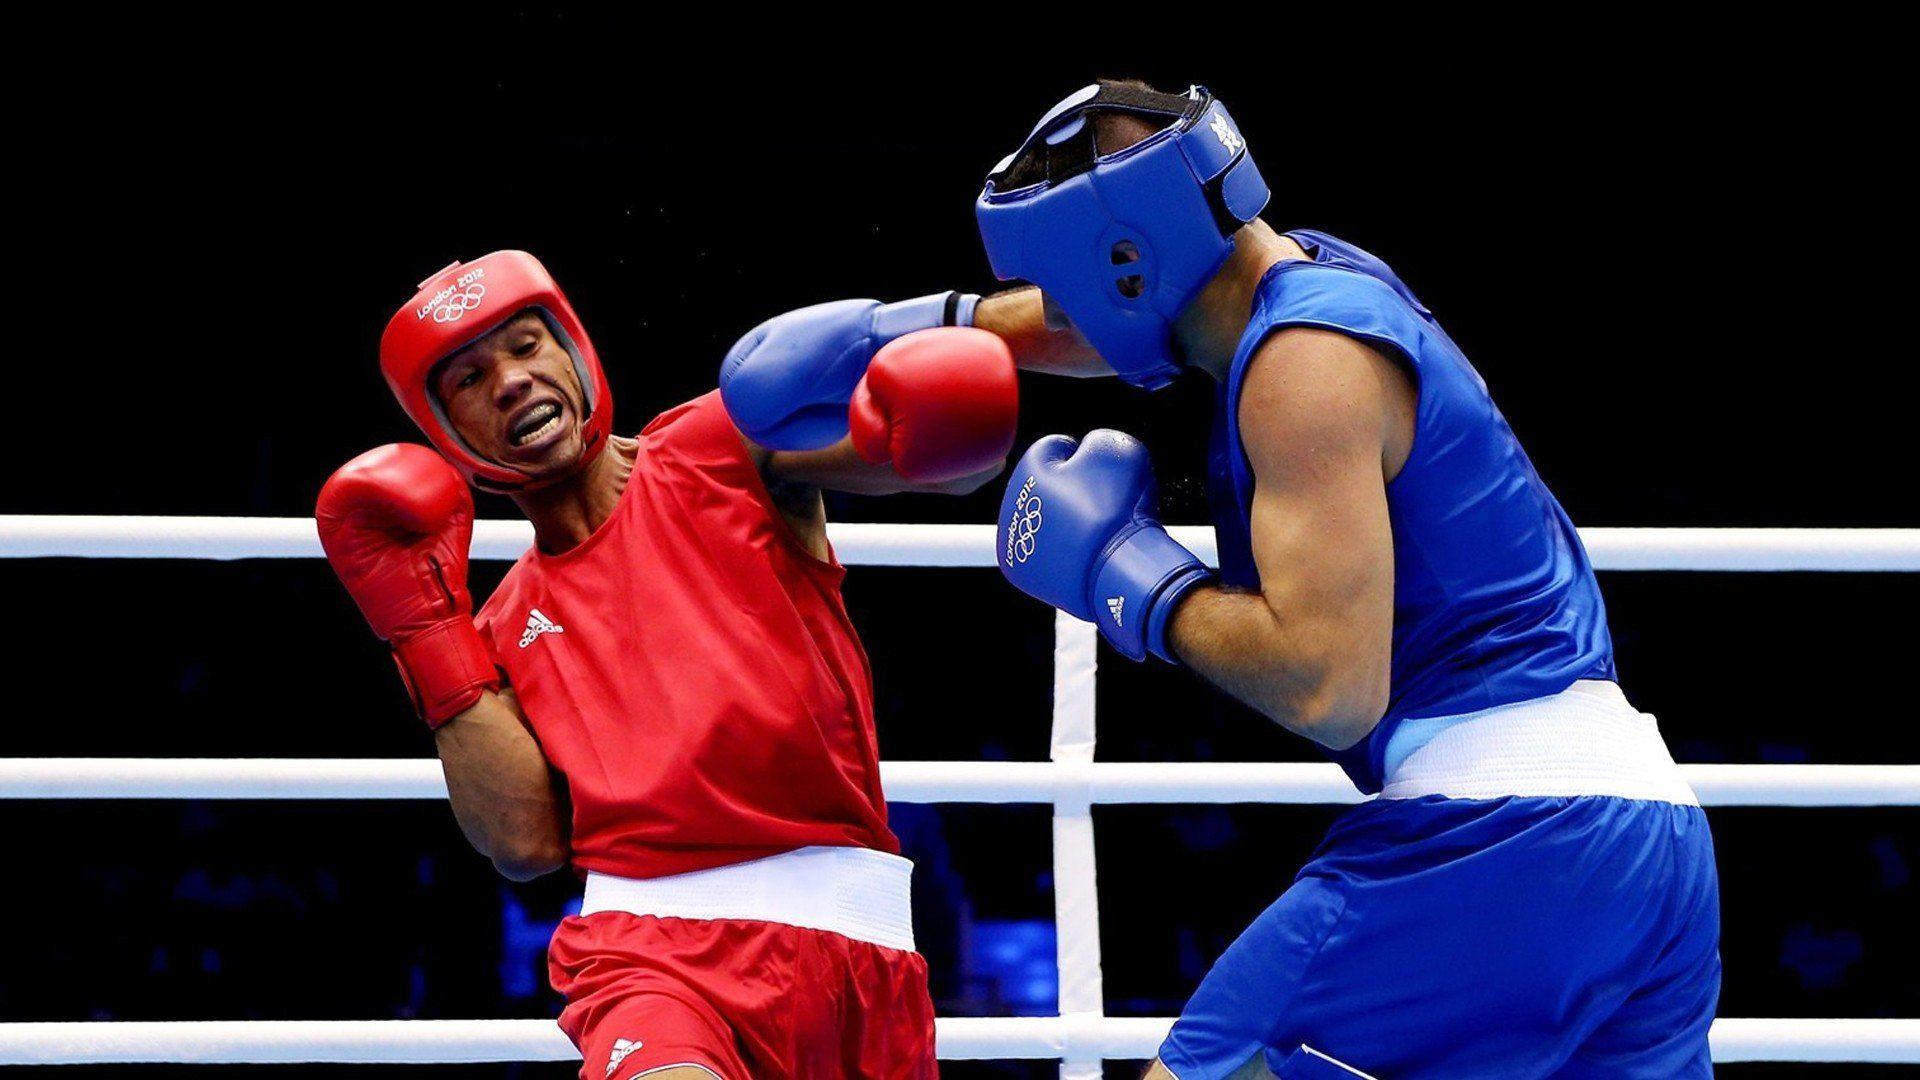 Boxing full screen hd wallpaper